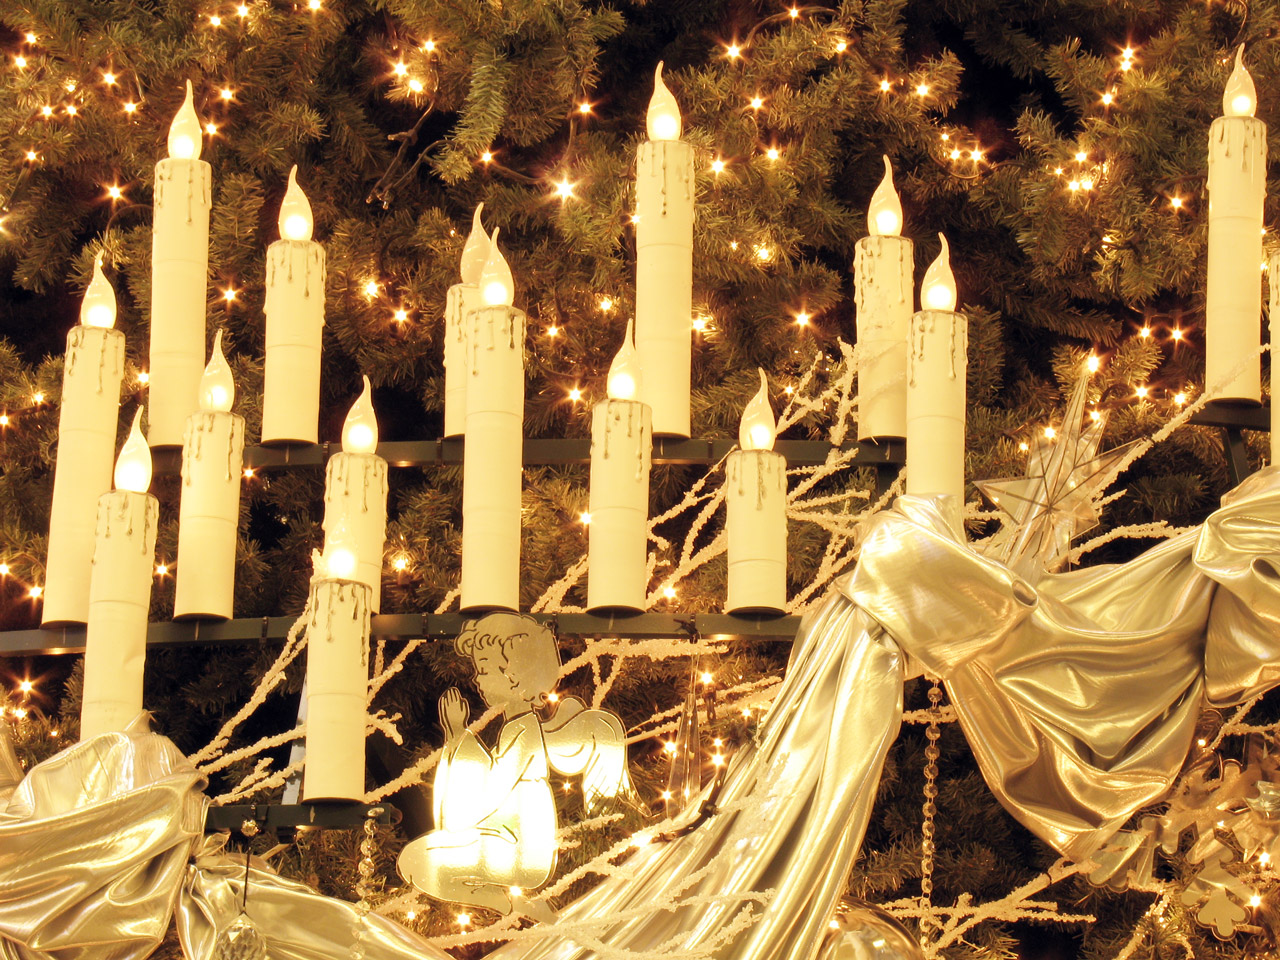 Weihnachtsbeleuchtung in Kerzenform